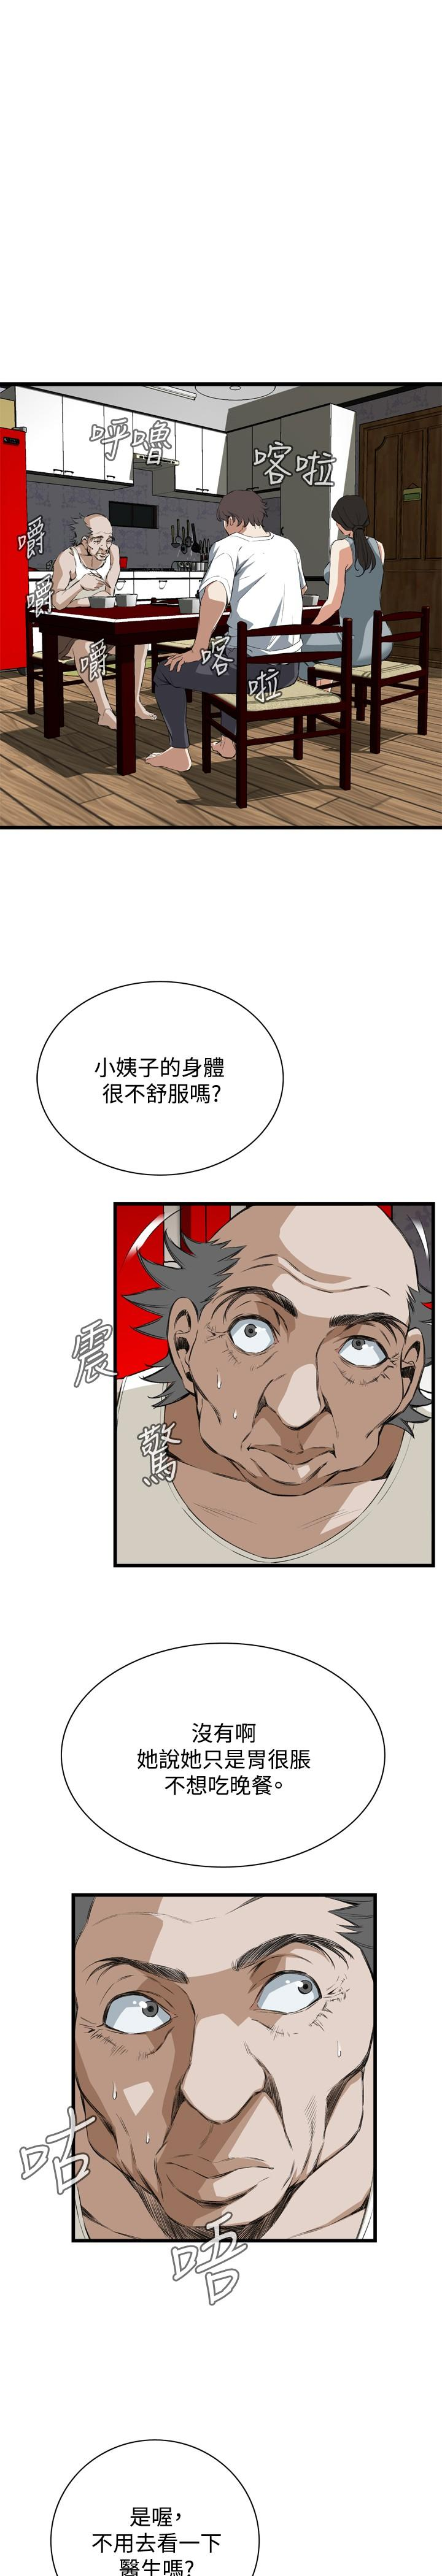 Take a Peek 偷窥 Ch.39~55 [Chinese]中文 415